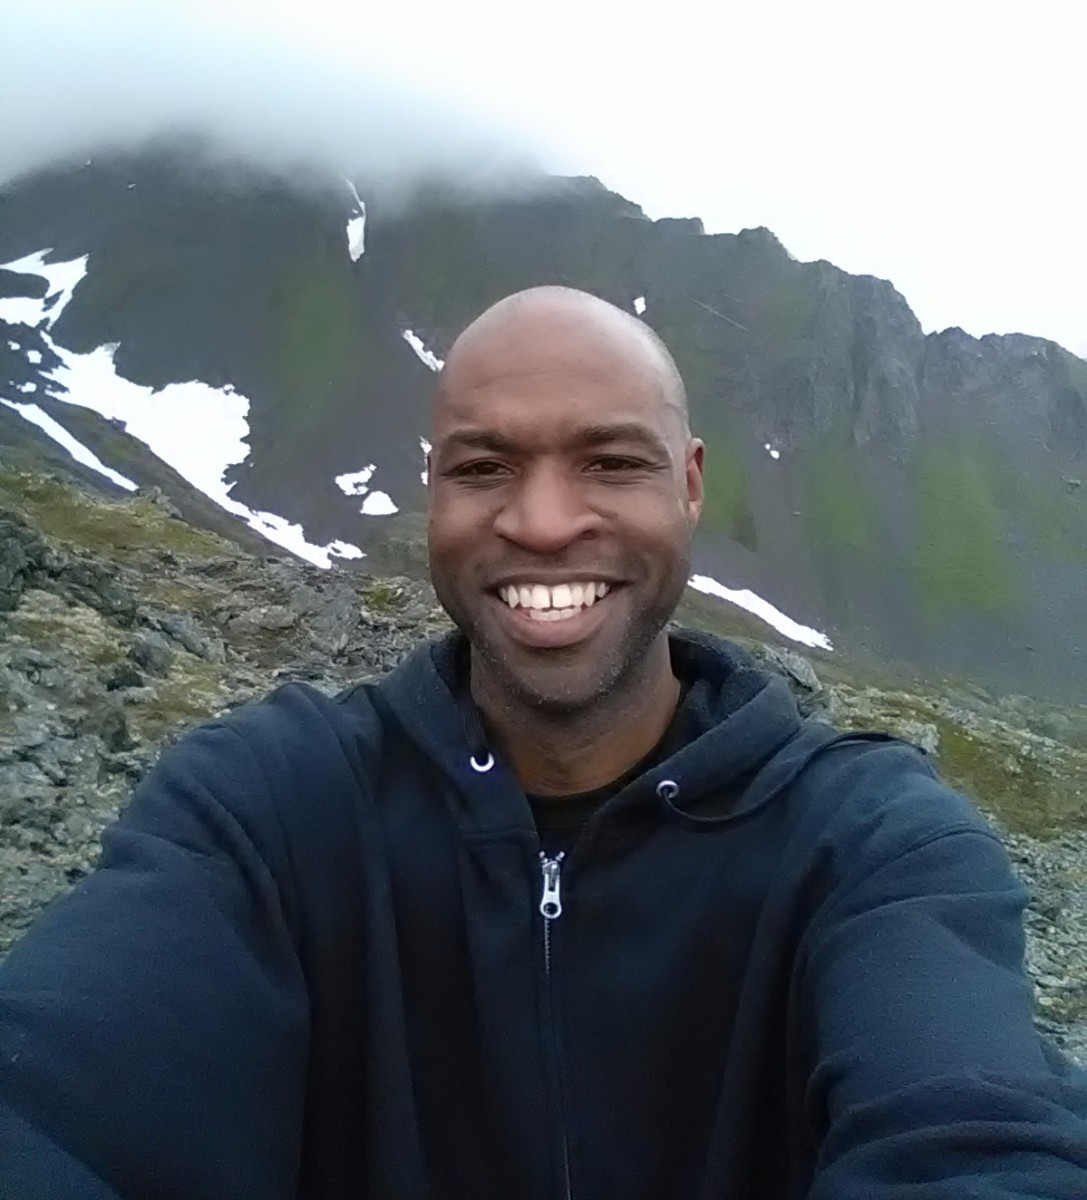 Near the top of Mount Marathon in Alaska